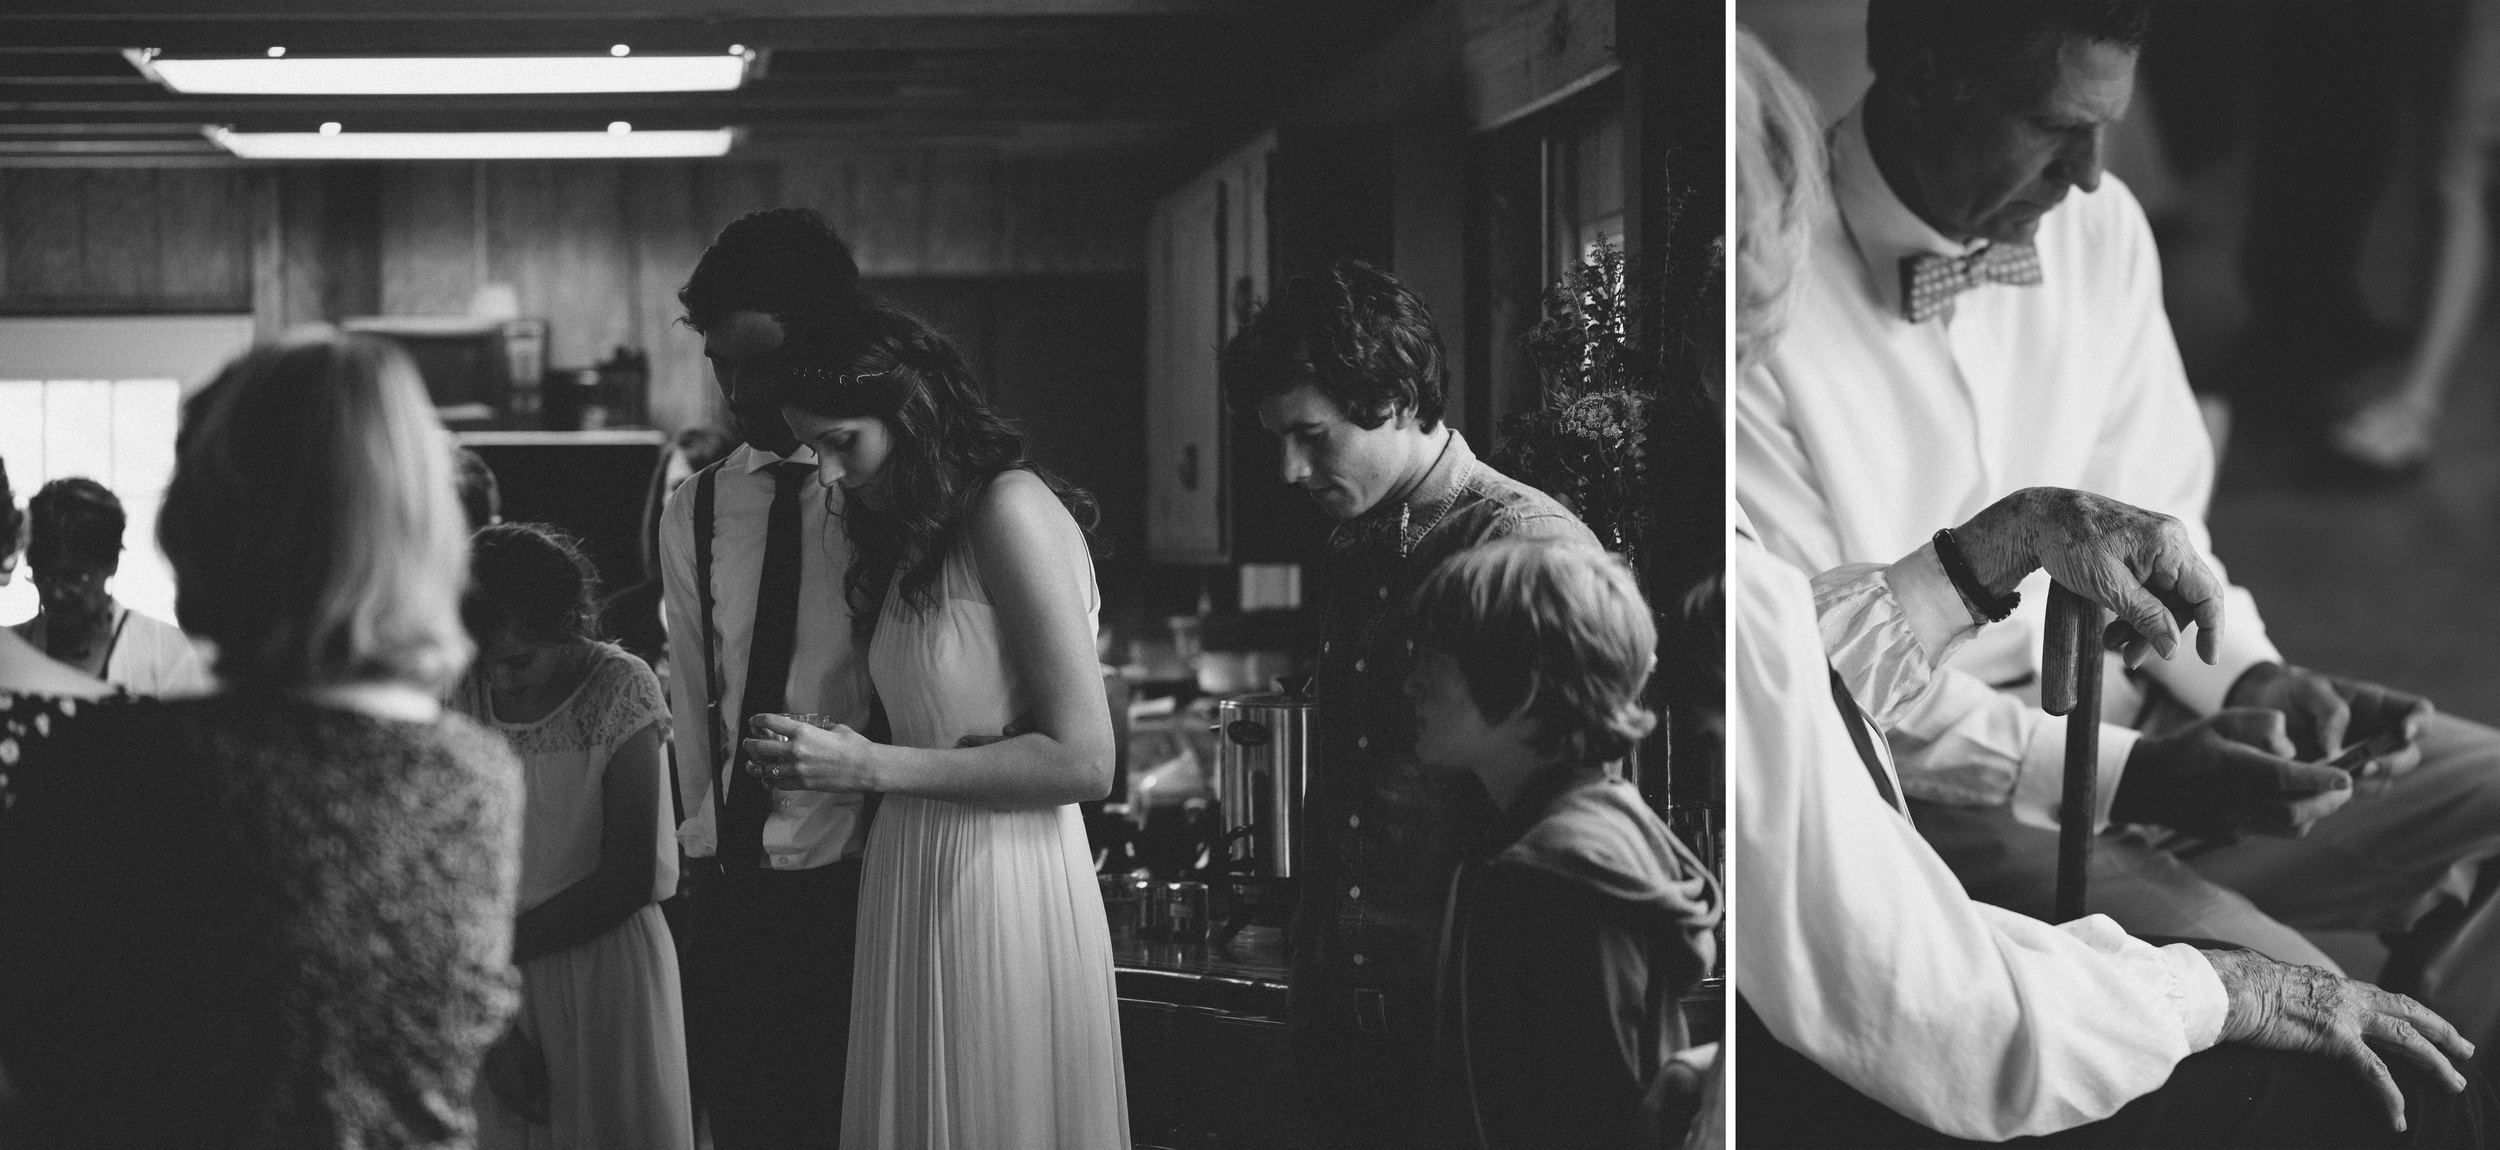 Zack + Hannah Millsaps Wedding in Greenville SC Nashville Wedding Photographer Photography Anthology-33 copy.jpg